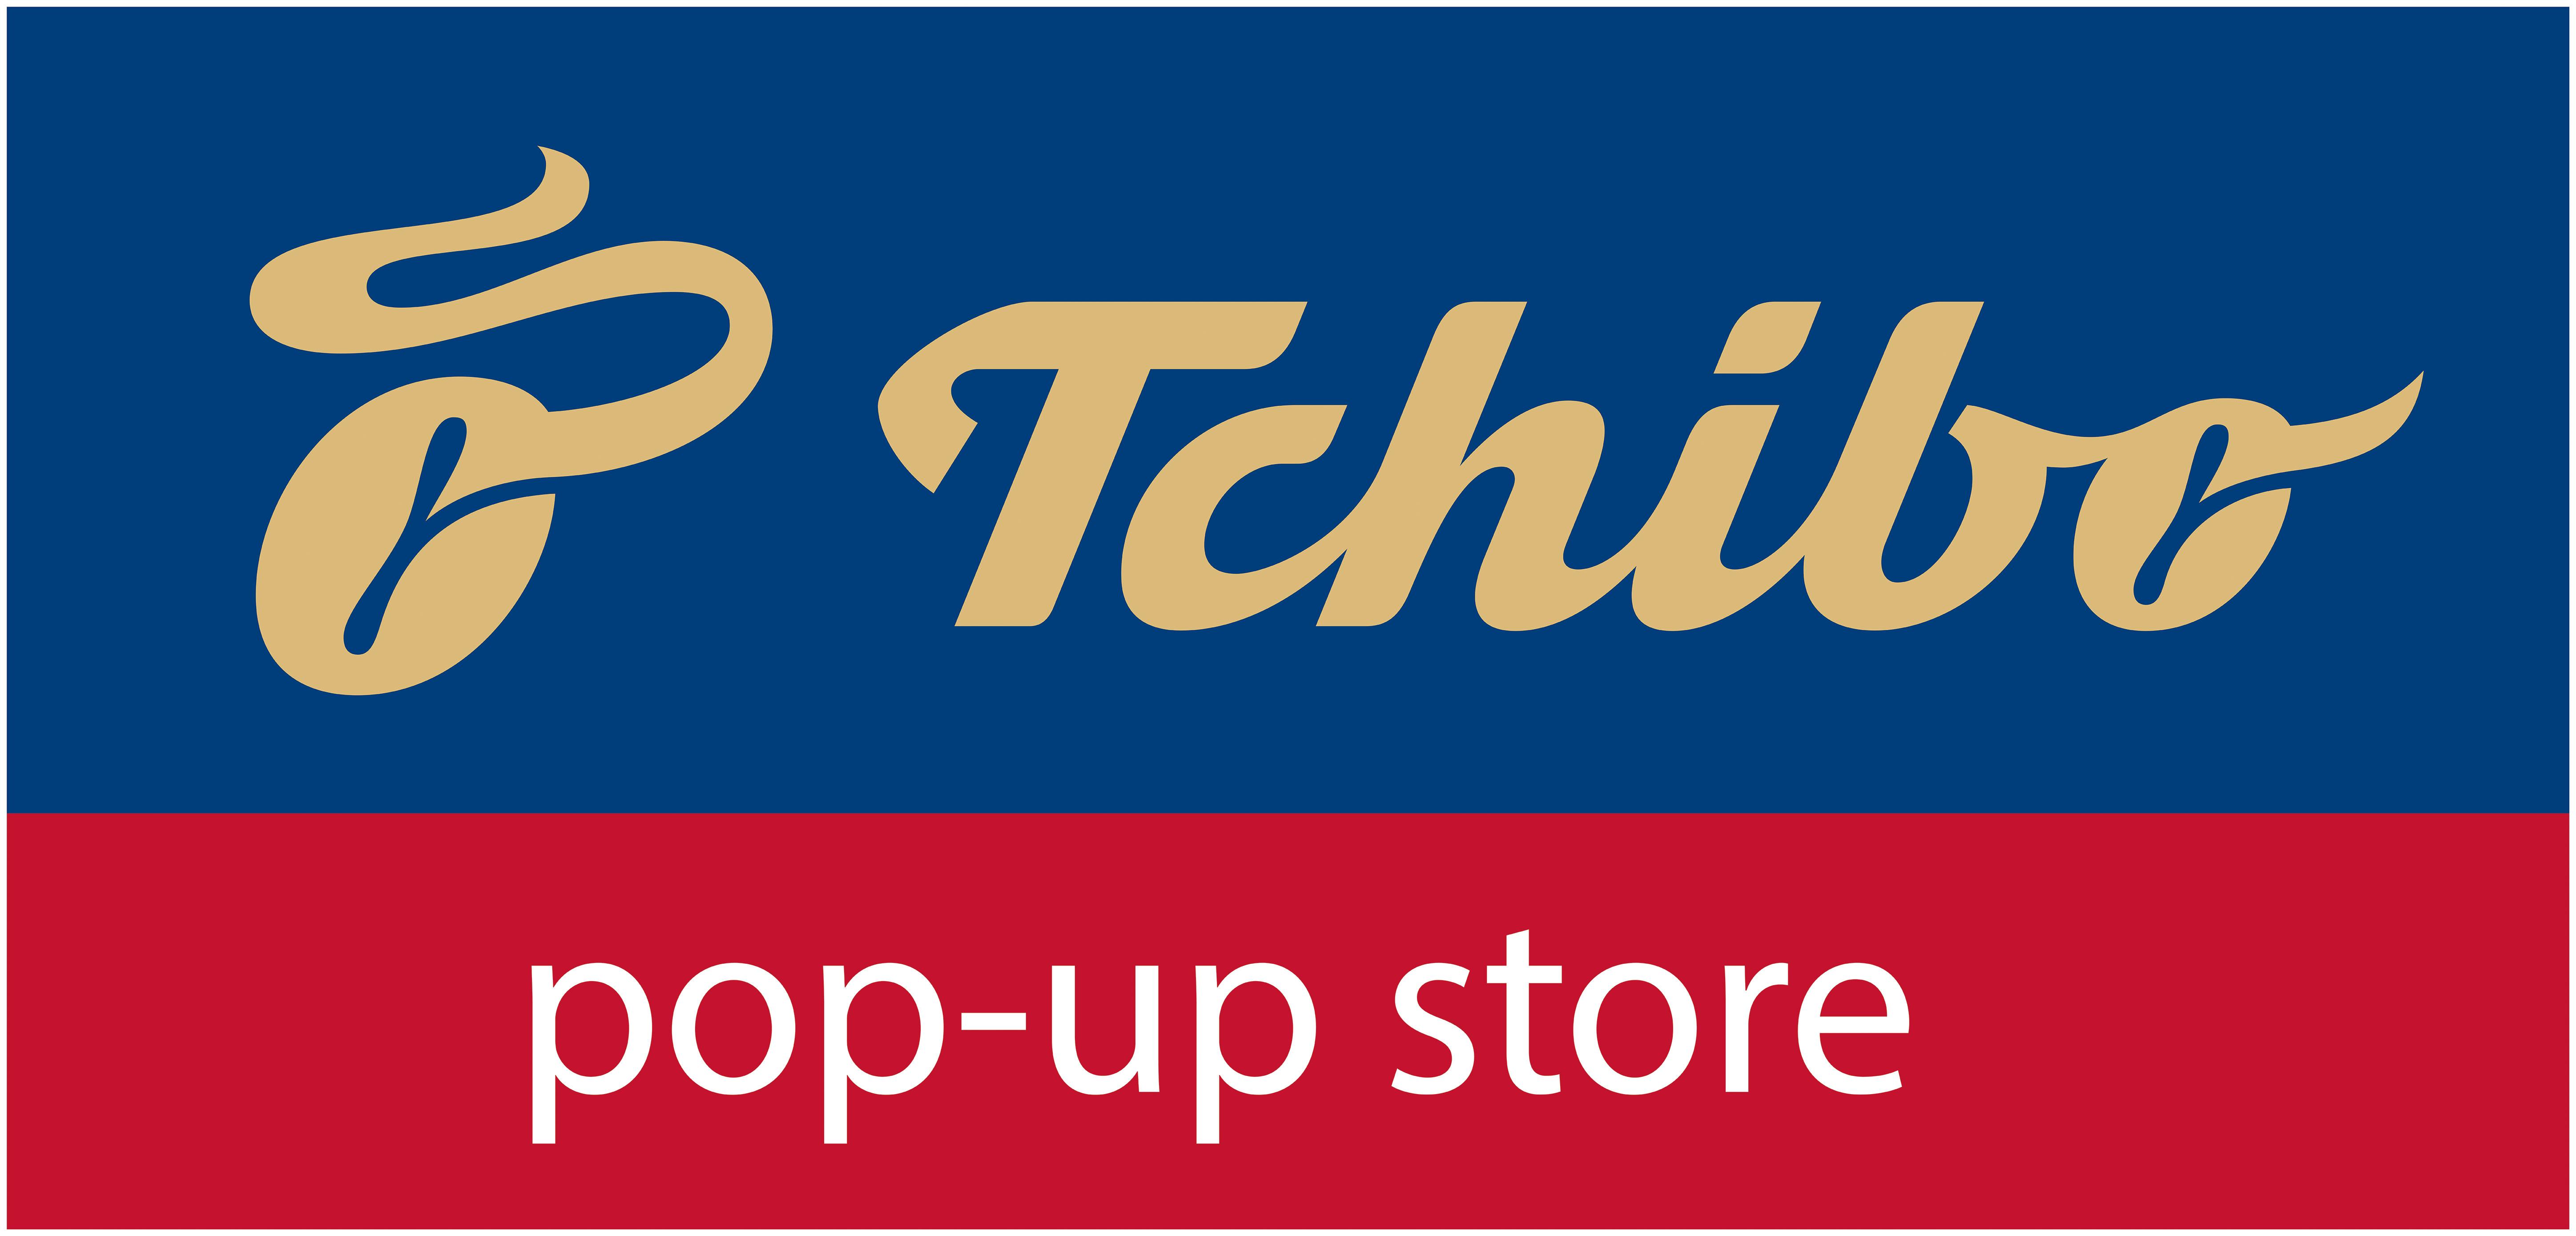 Tchibo pop-up store